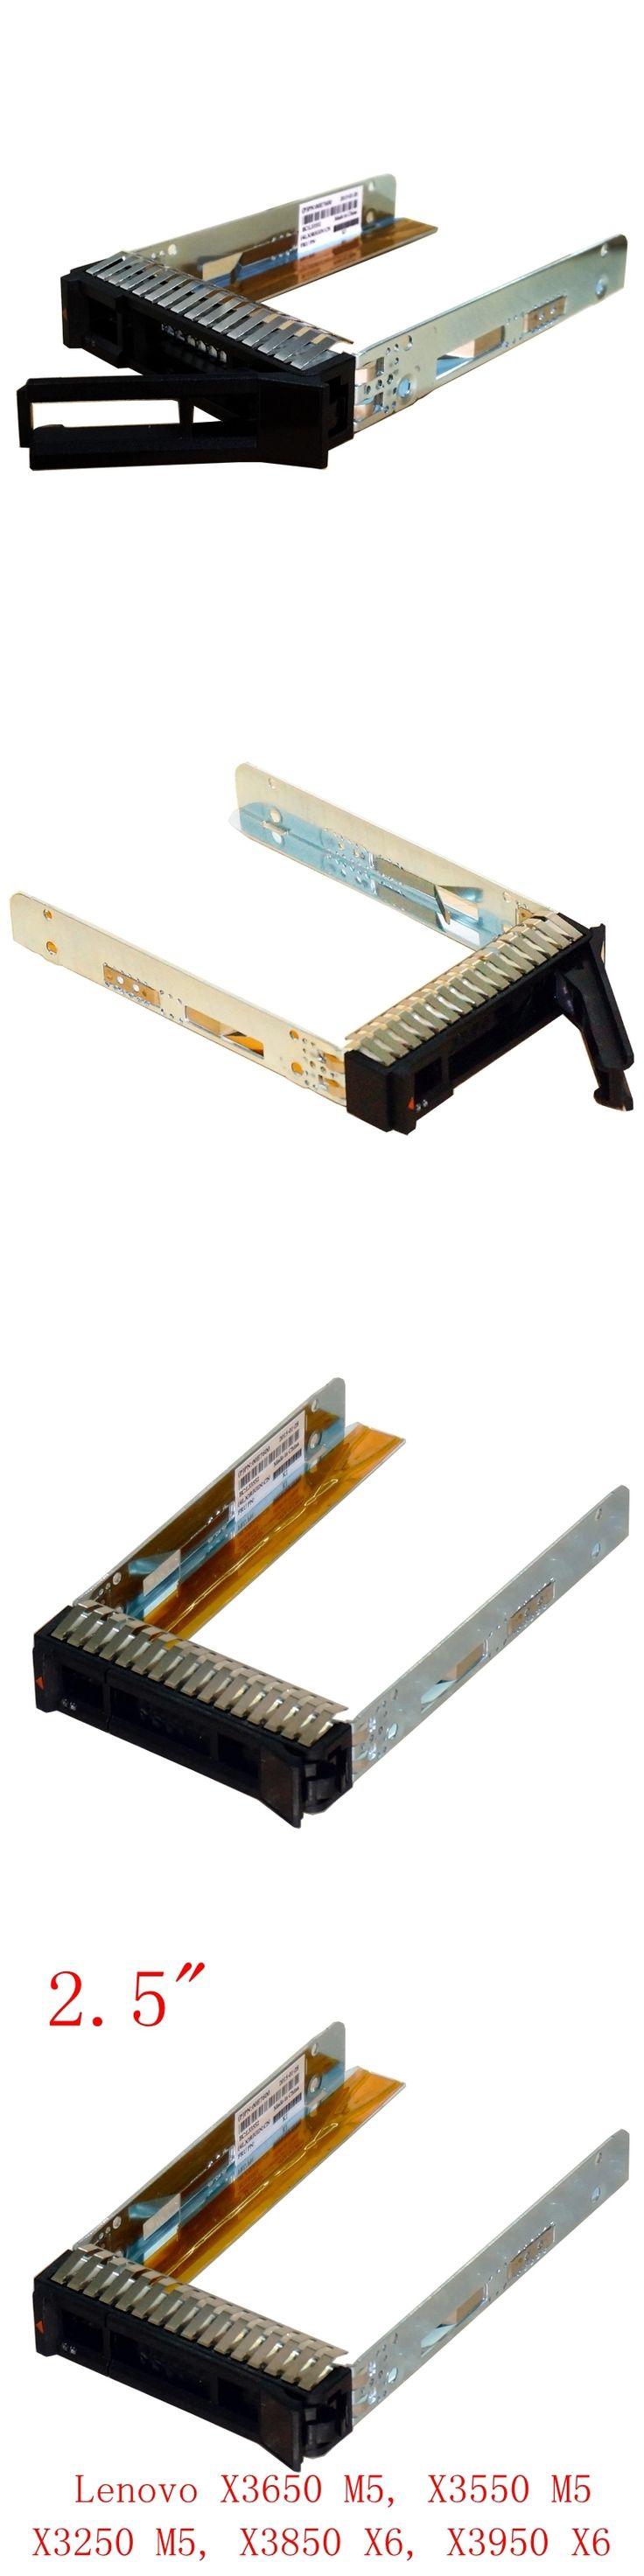 "2.5"" Drive Tray Caddy for IBM/Lenovo X3650 M5, X3550 M5, X3250 M5, X3850 X6, X3950 X6. 00E7600 L38552 Free Shipping"